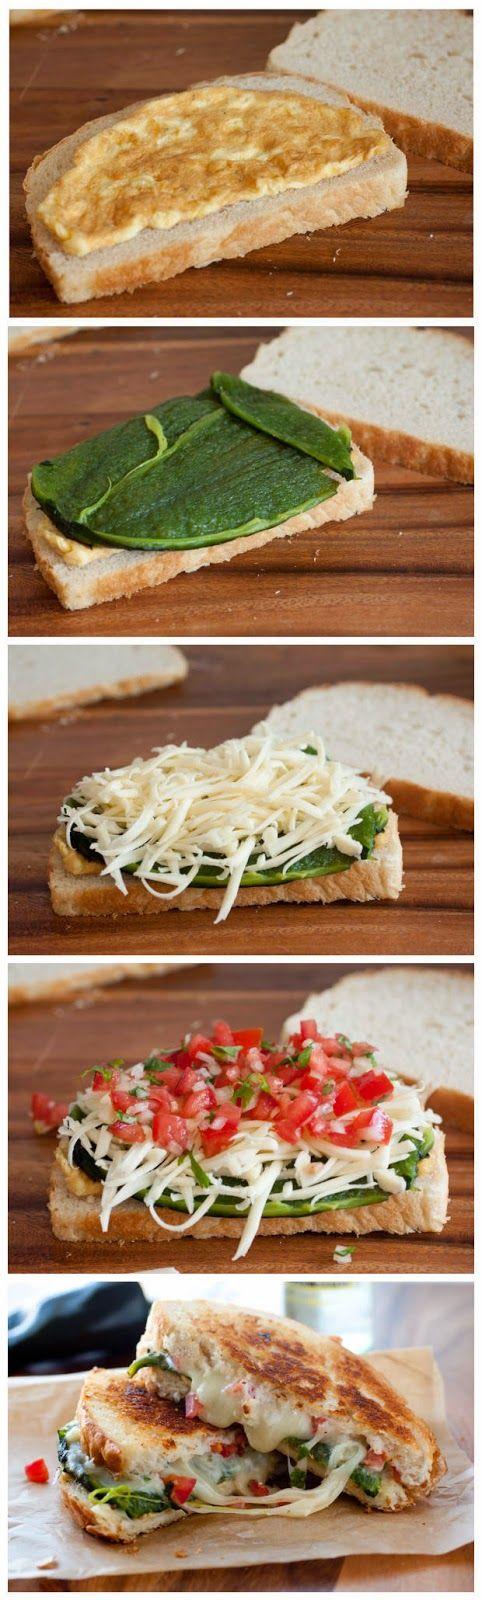 Chile Relleno Grilled Cheese Sandwich. Monterey jack cheese.  Chile pasilla. Bread.  Eggs.